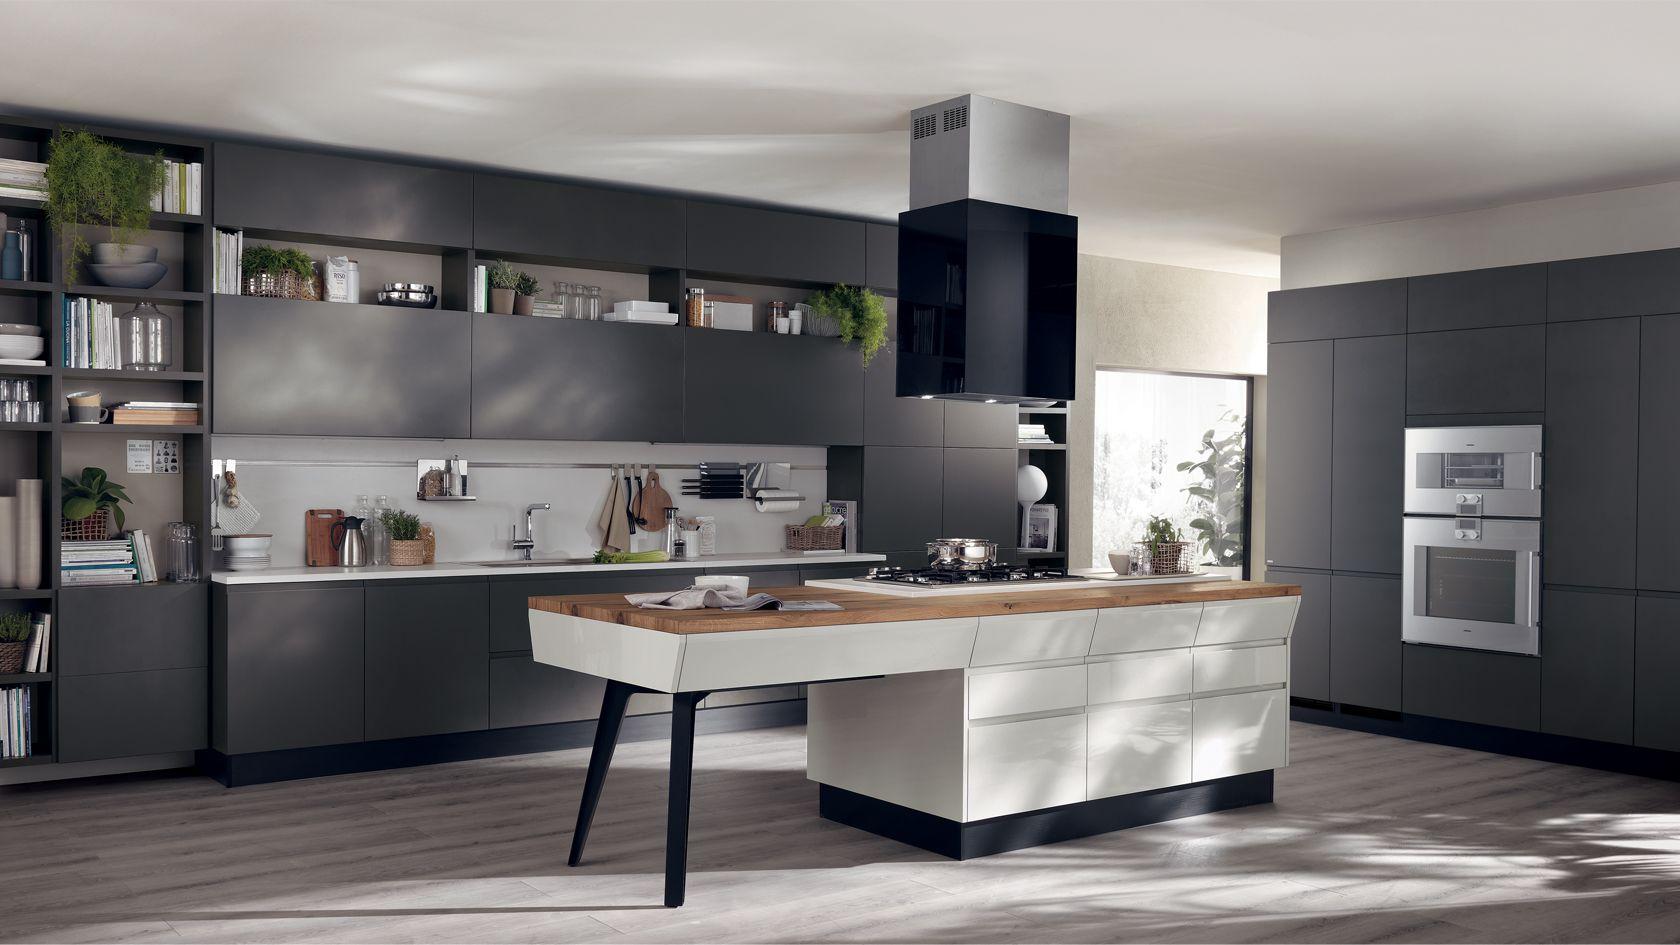 Pin by marina ippoliti on cucine scavolini pinterest cucina